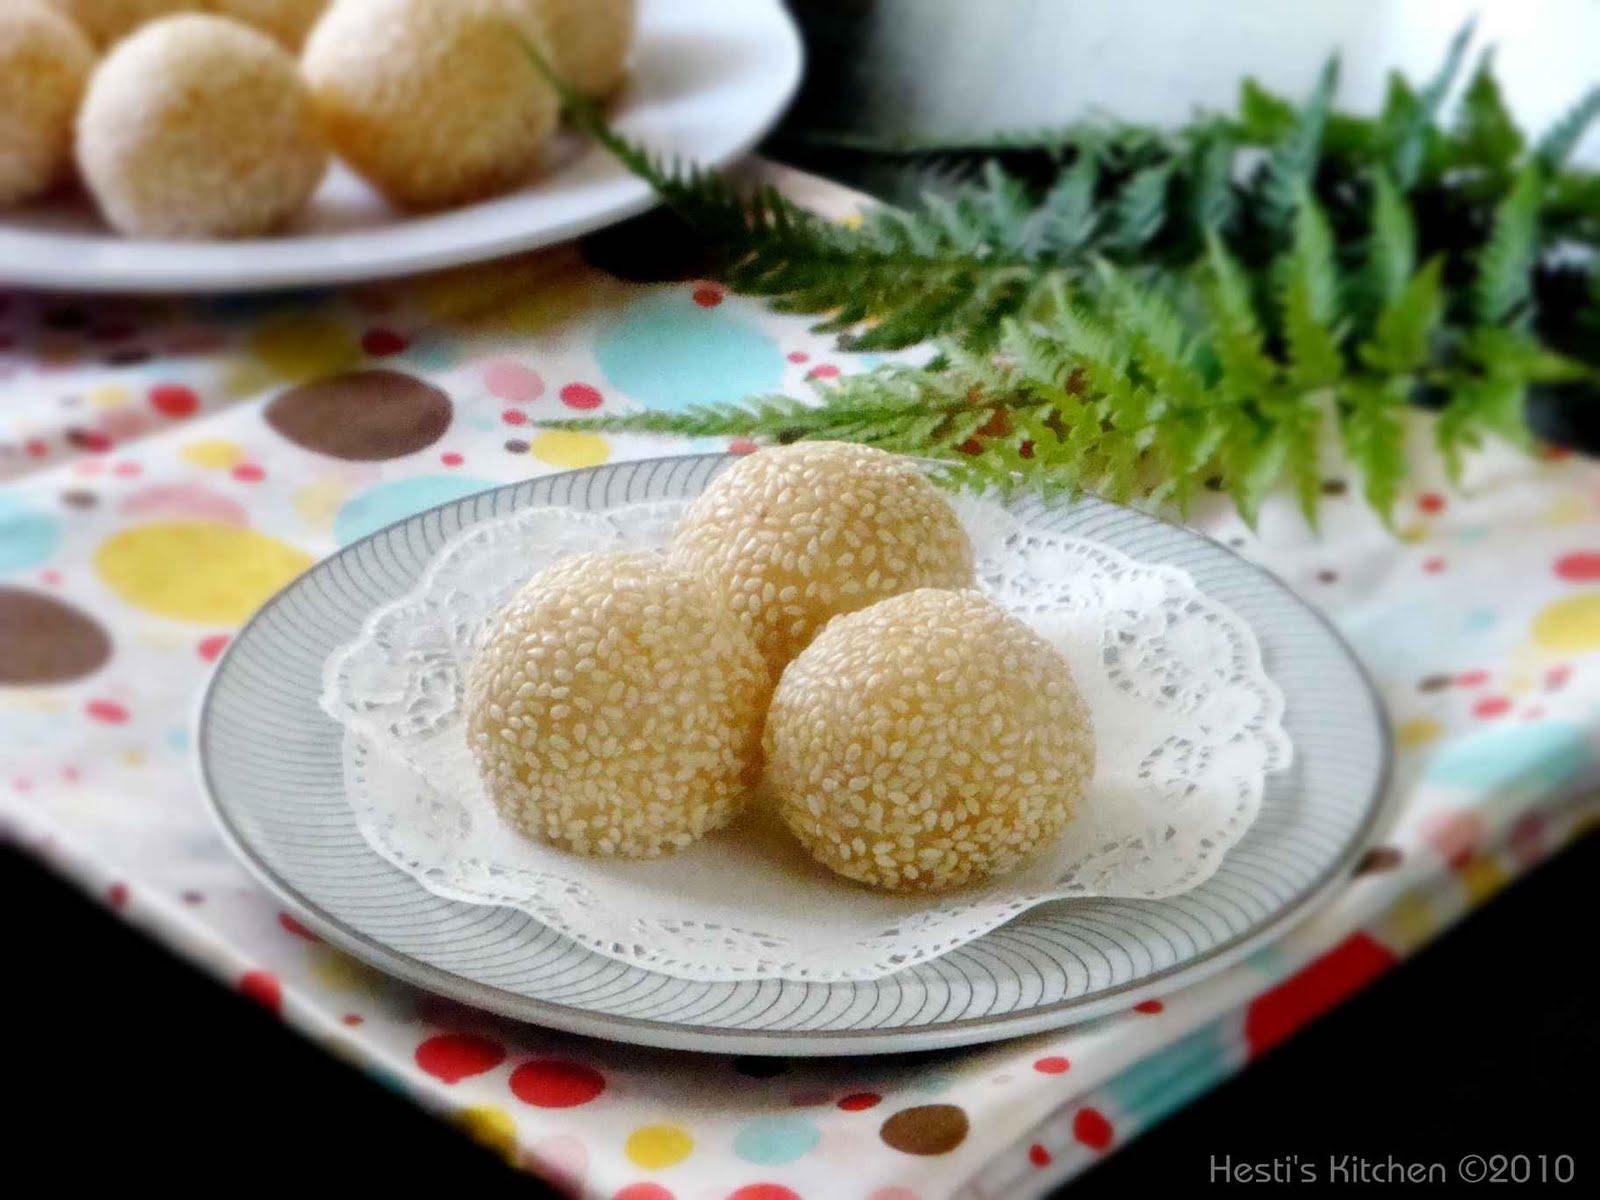 HESTI'S KITCHEN : yummy for your tummy: Onde-onde